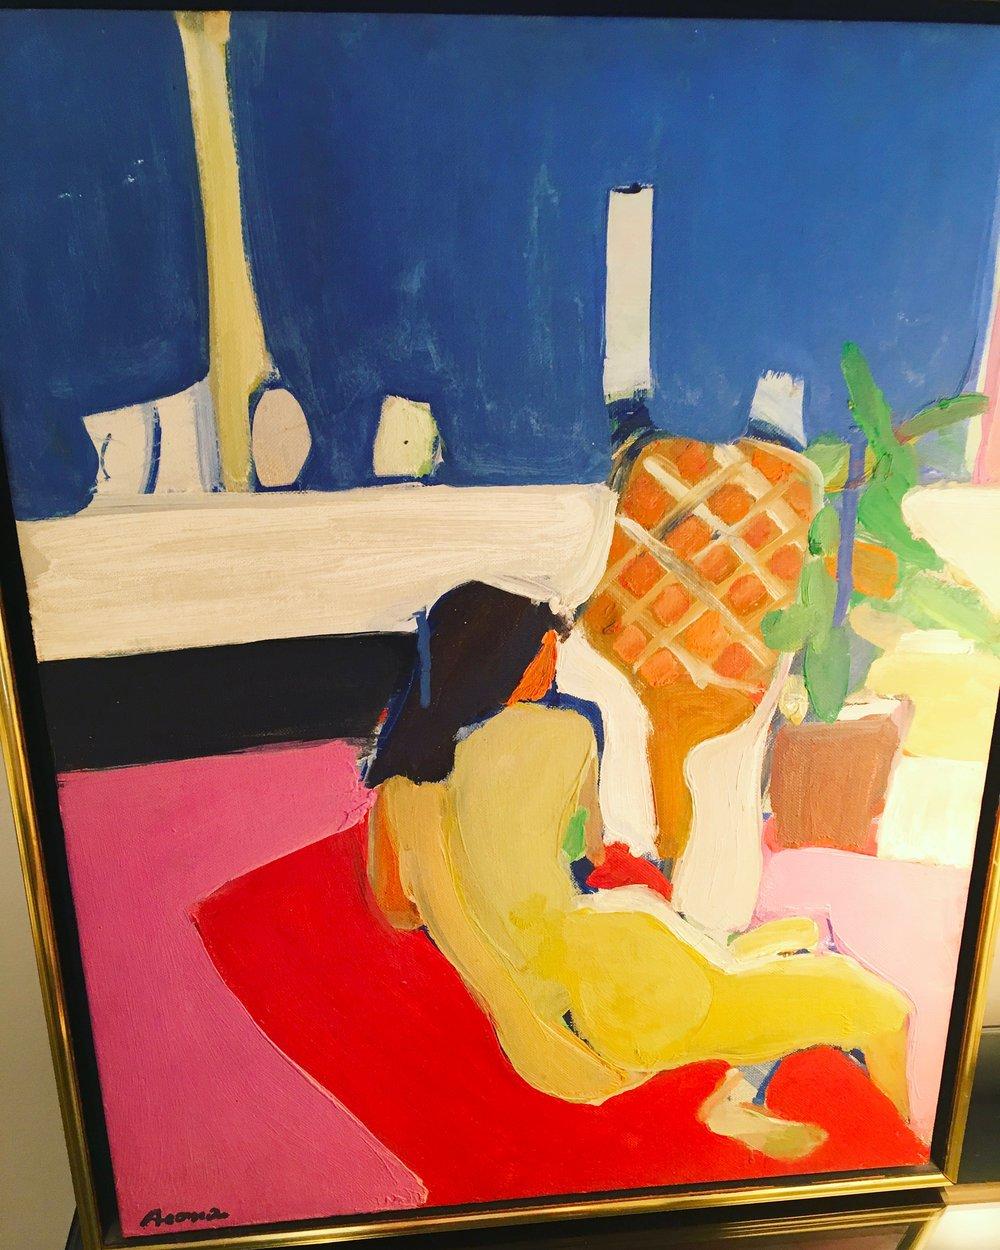 OIL BY TADASHI ASOMA